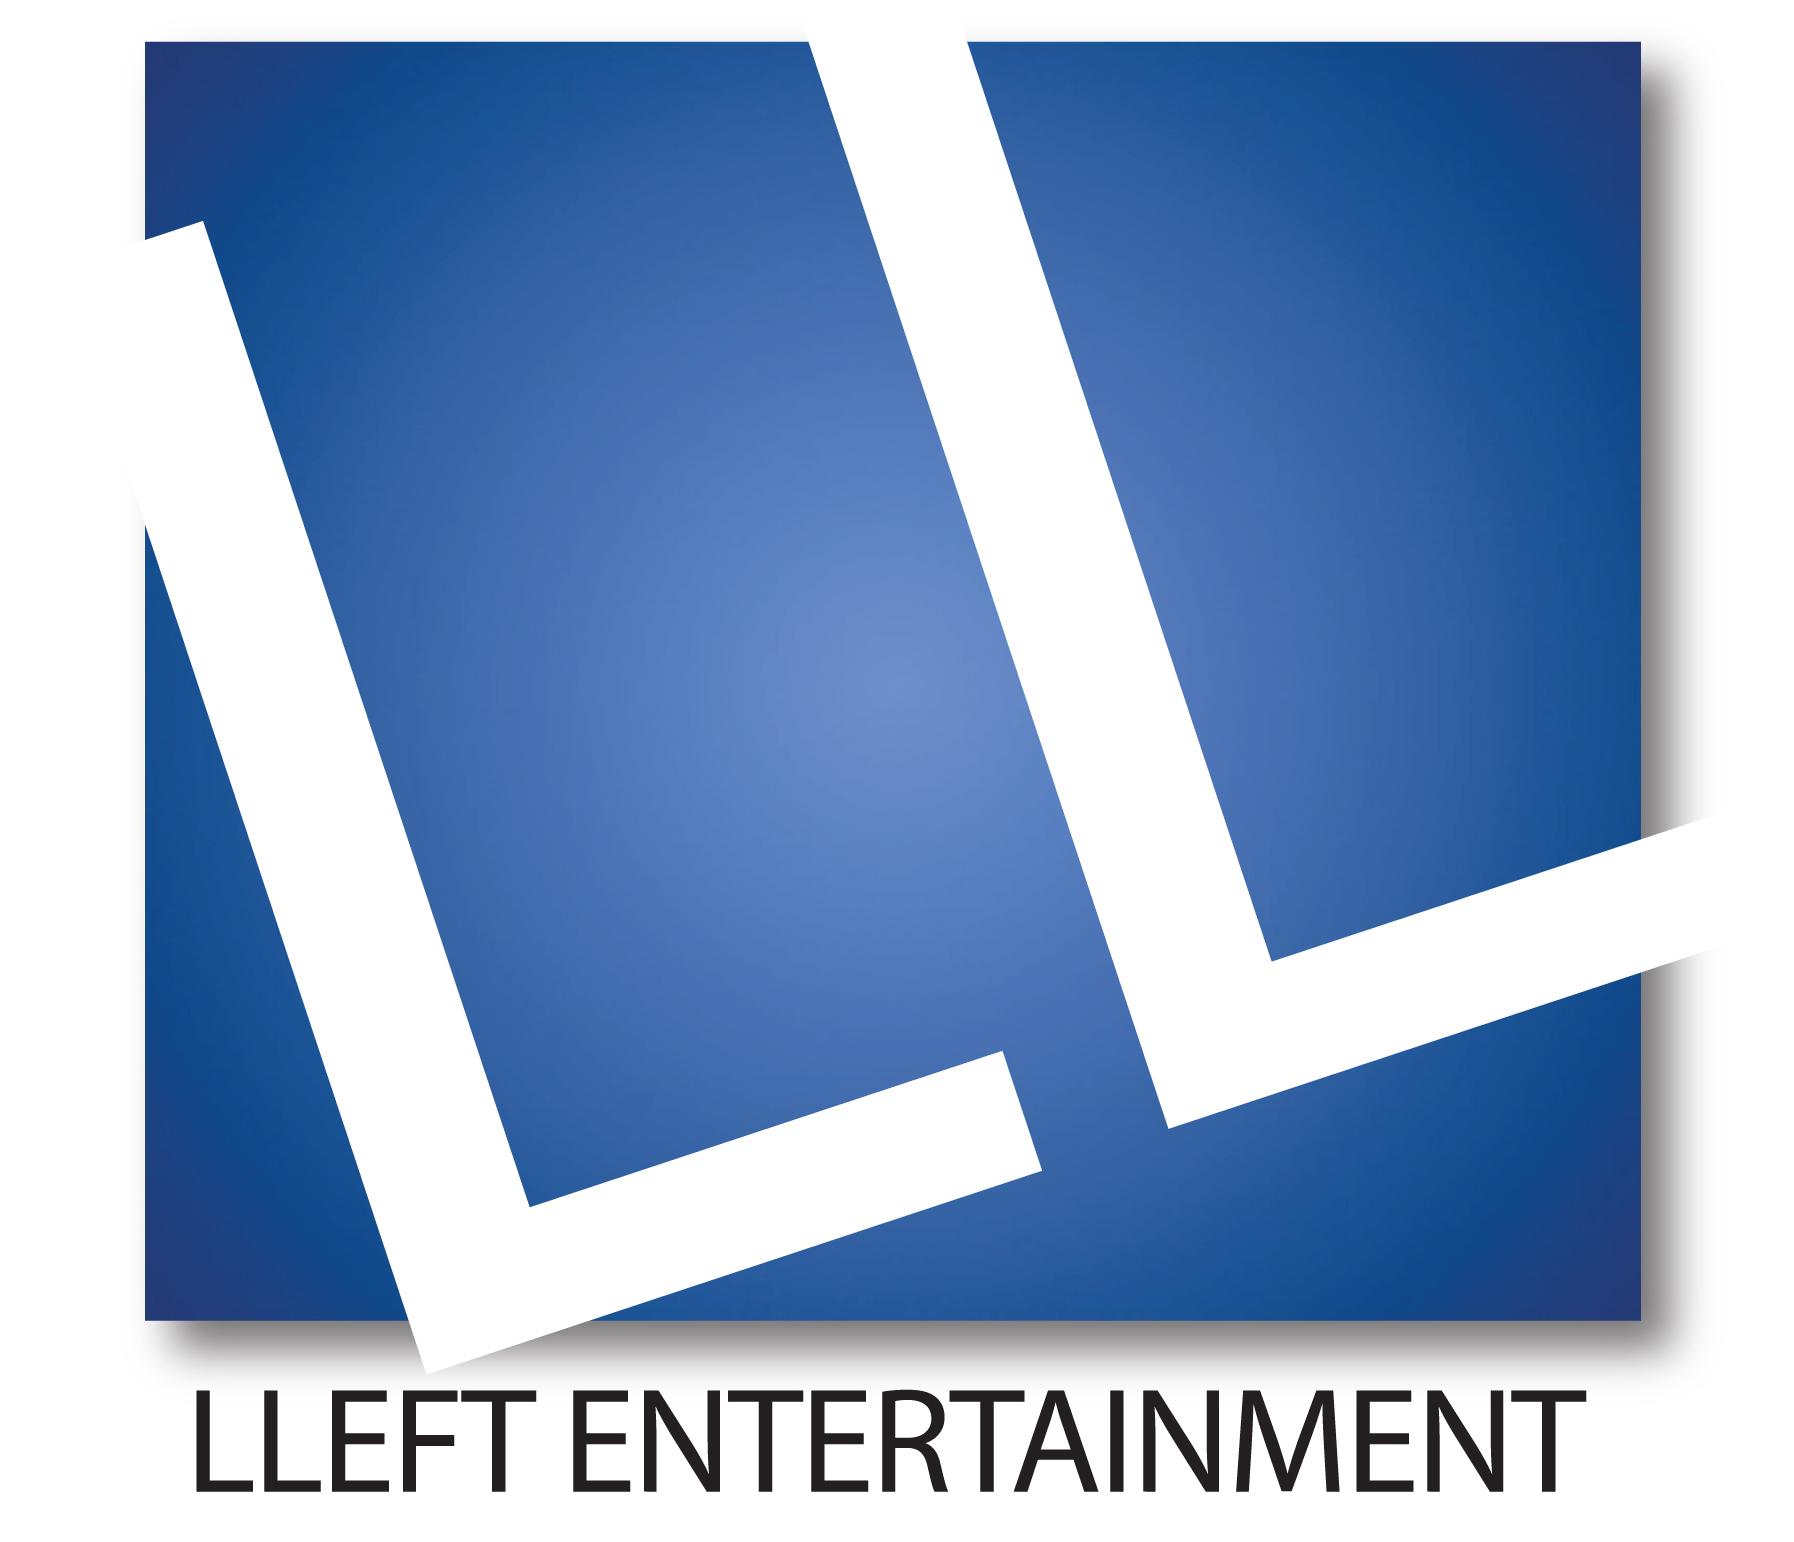 LLeft Entertainment Online Training